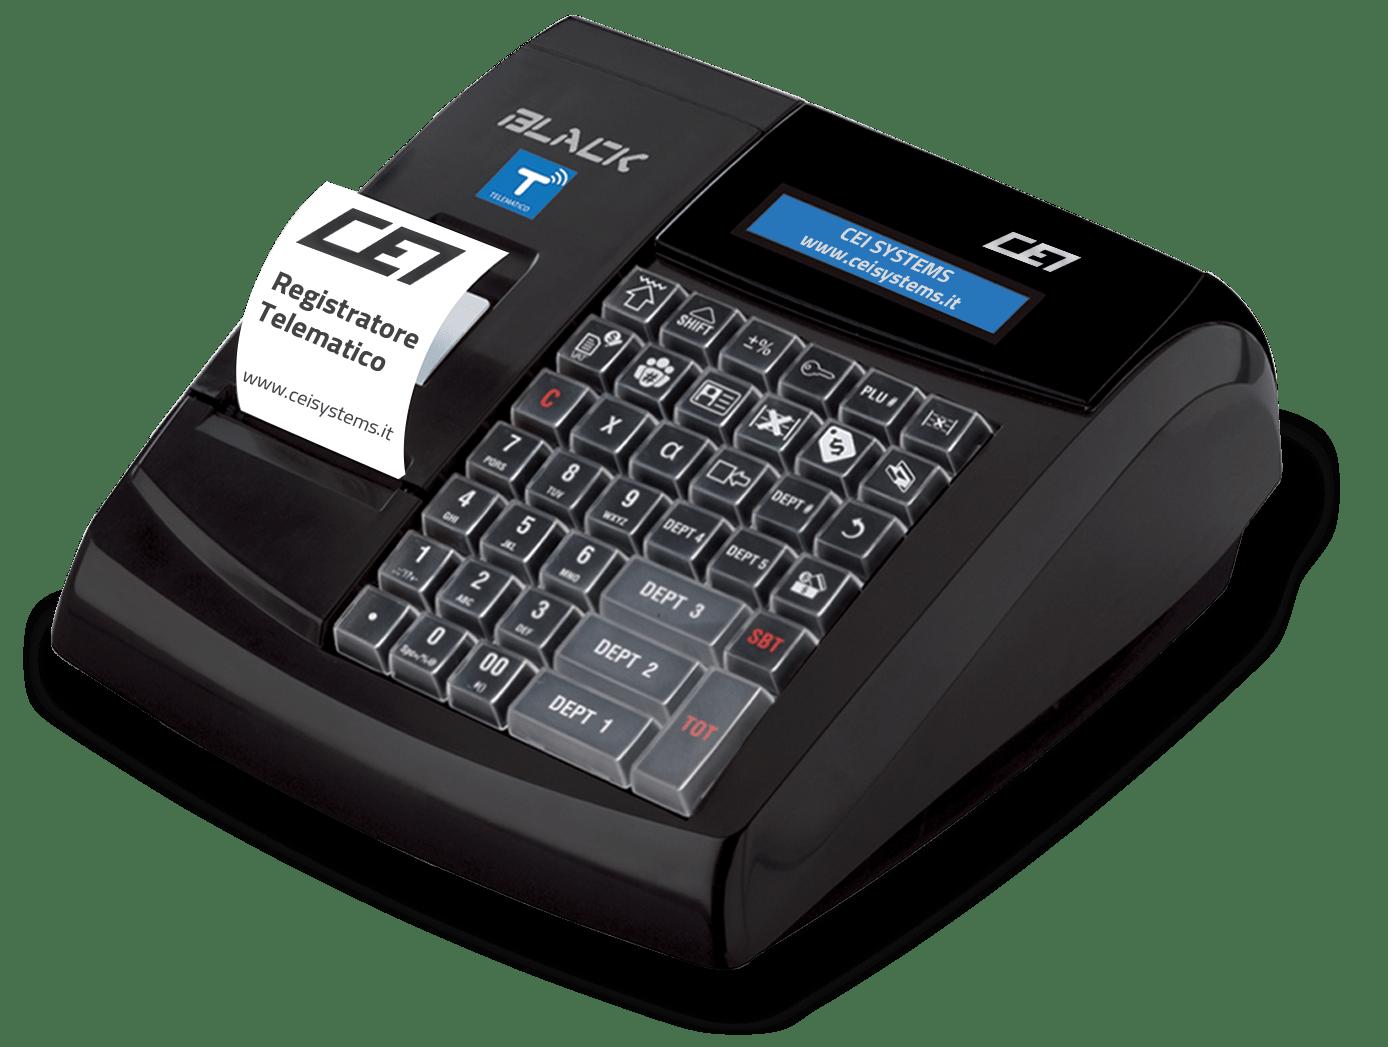 registratore di cassa telematico Big-Plus